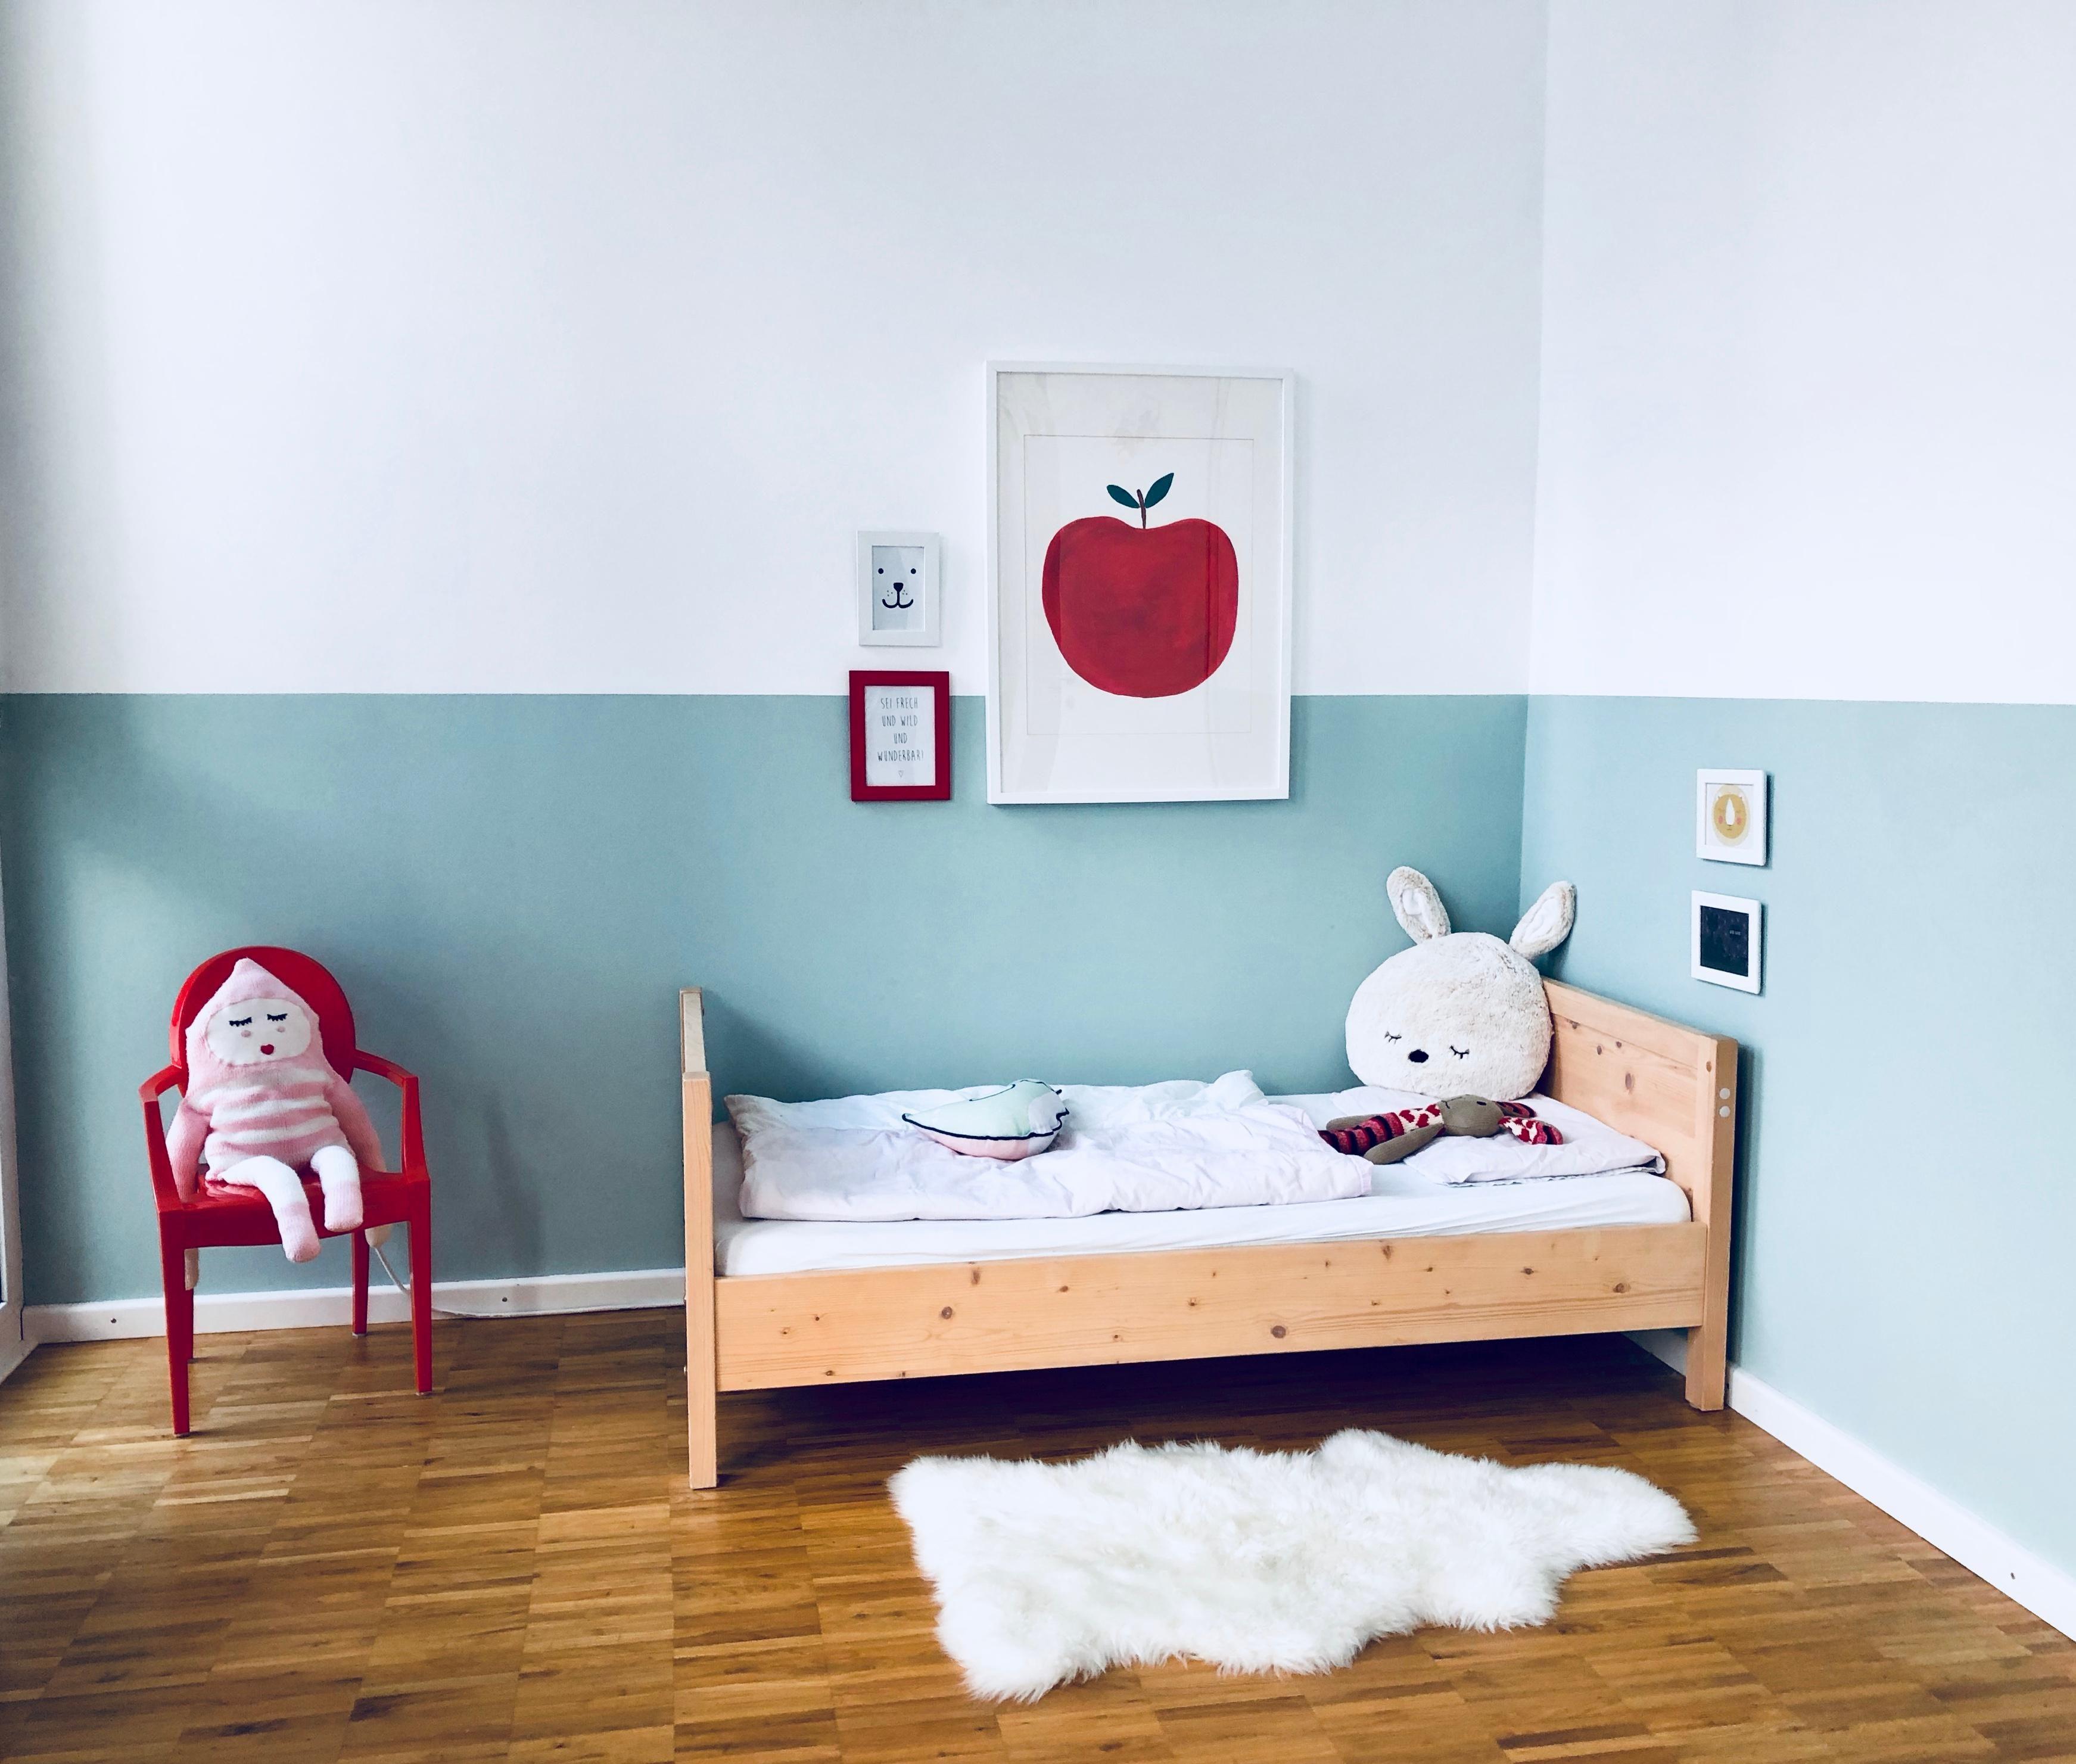 #Kinderzimmer #Mädchenzimmer #Wandfarbe #mintgrün #Wandgestaltung